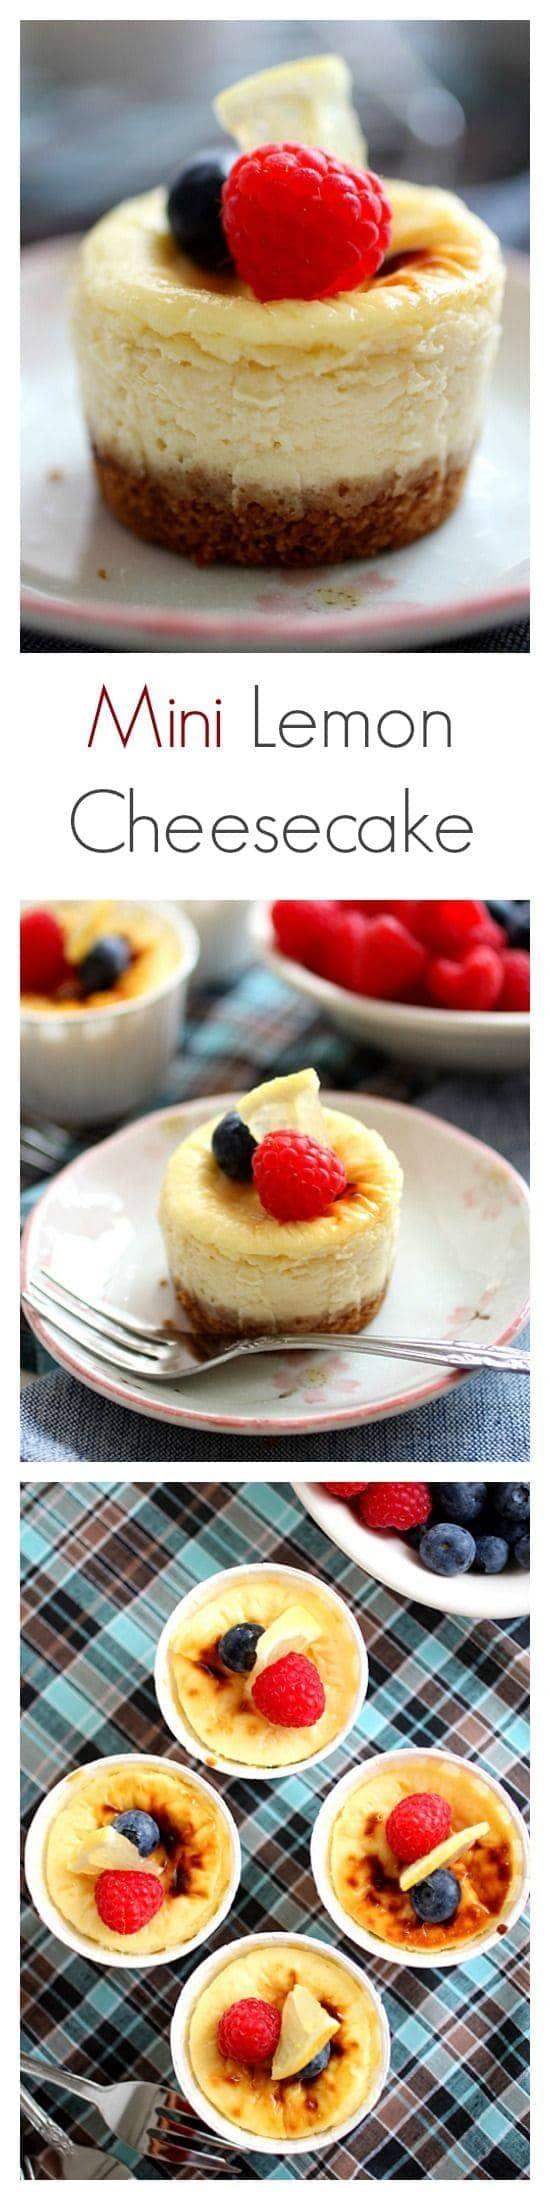 Mini lemon cheesecake recipe. Super rich, creamy, and citrusy cheesecake, in a cute mini size. Make yours today | rasamalaysia.com